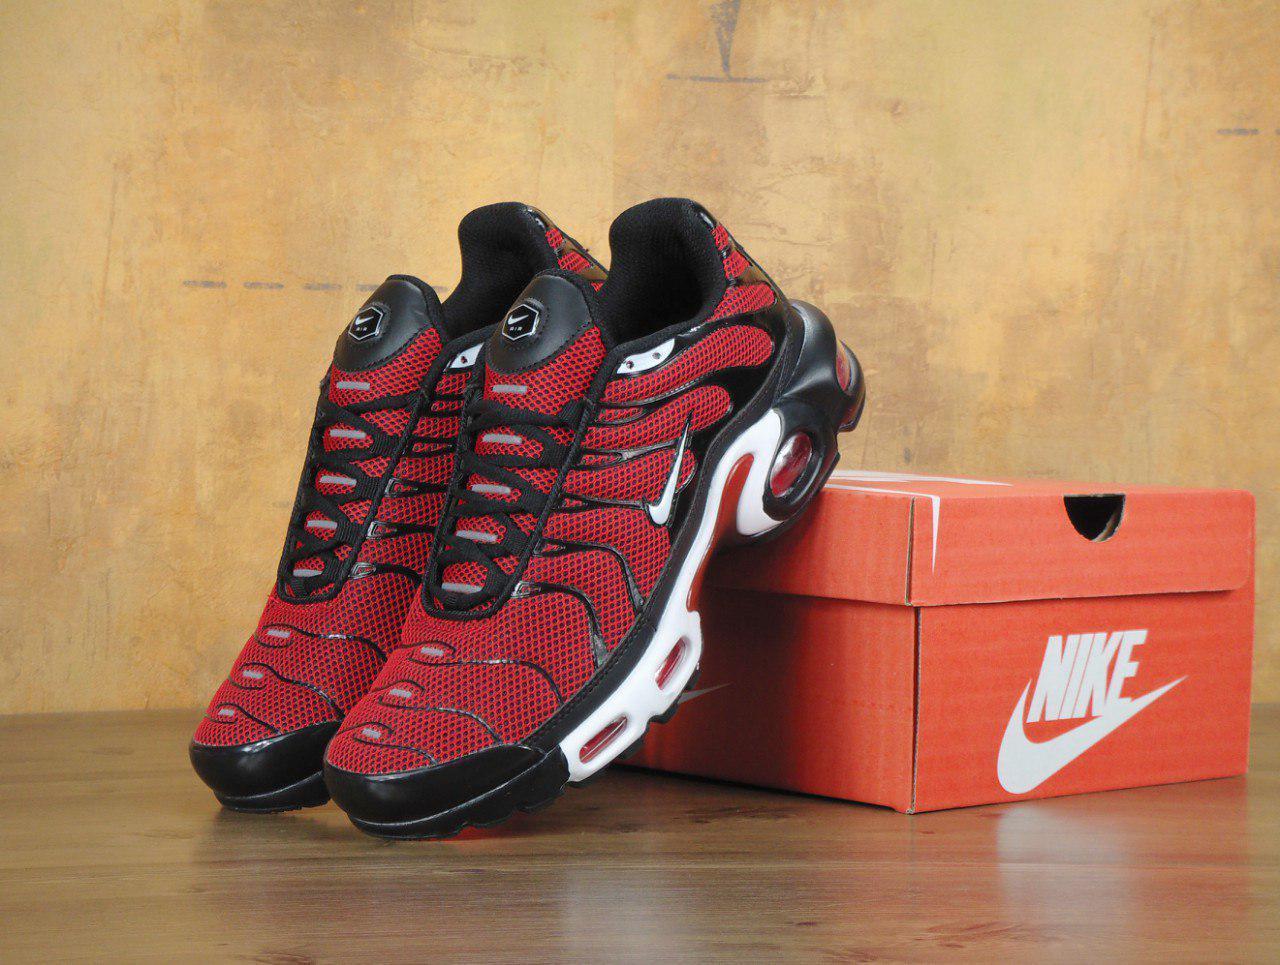 Кроссовки Nike Air Max TN реплика ААА+ размер 40-42,46 красный, фото 1